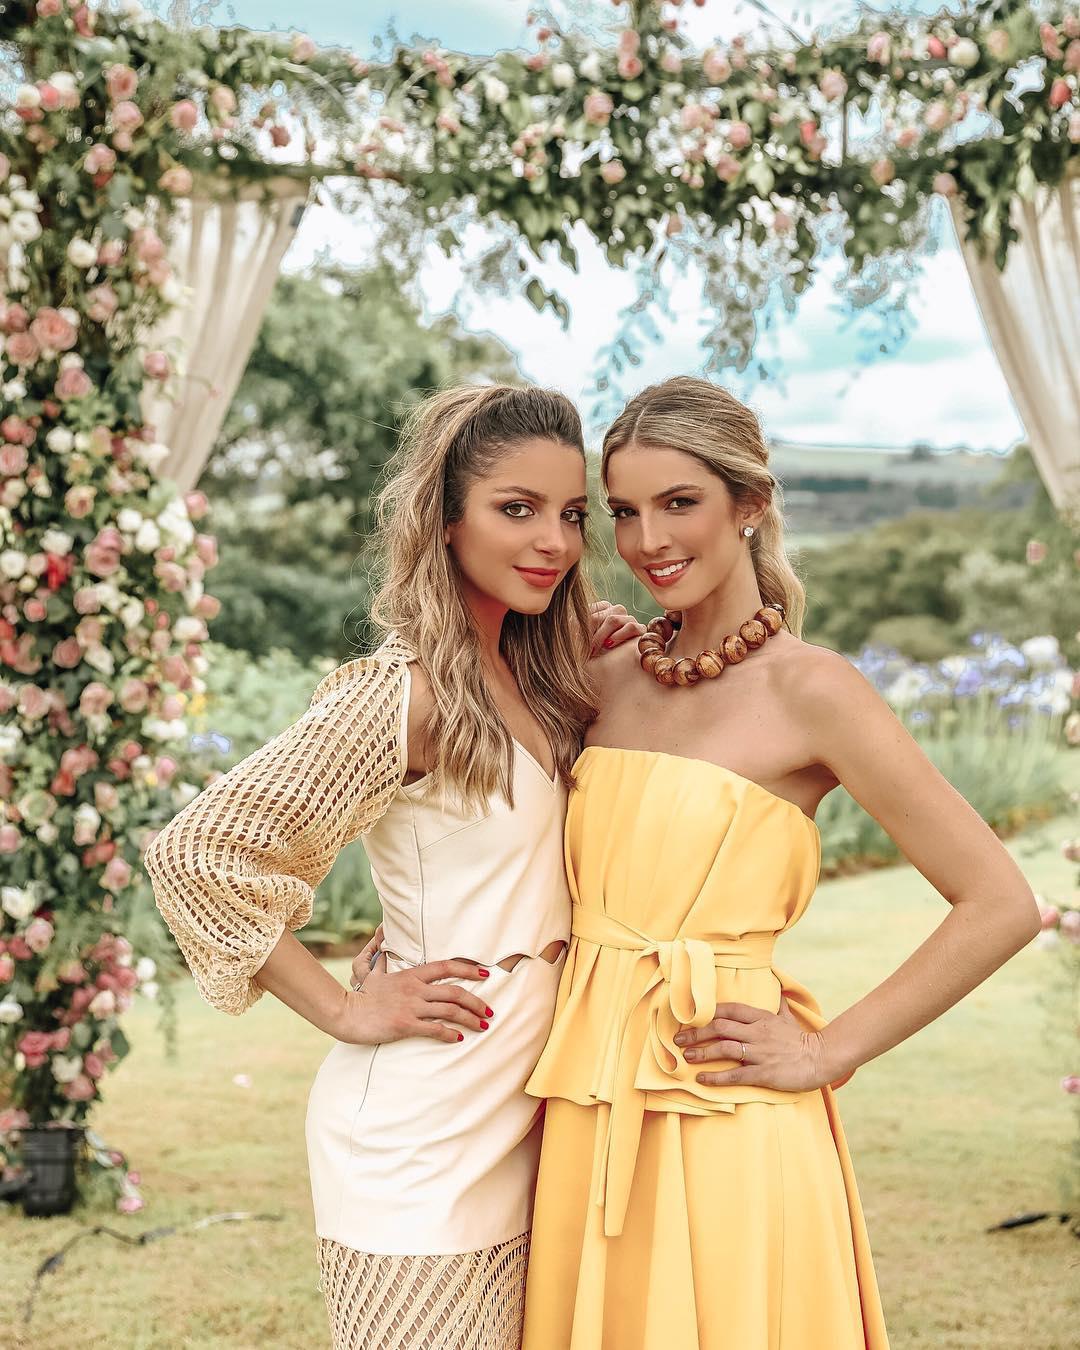 Noivado de Thassia Naves Sara Mattar e Paula Drumond